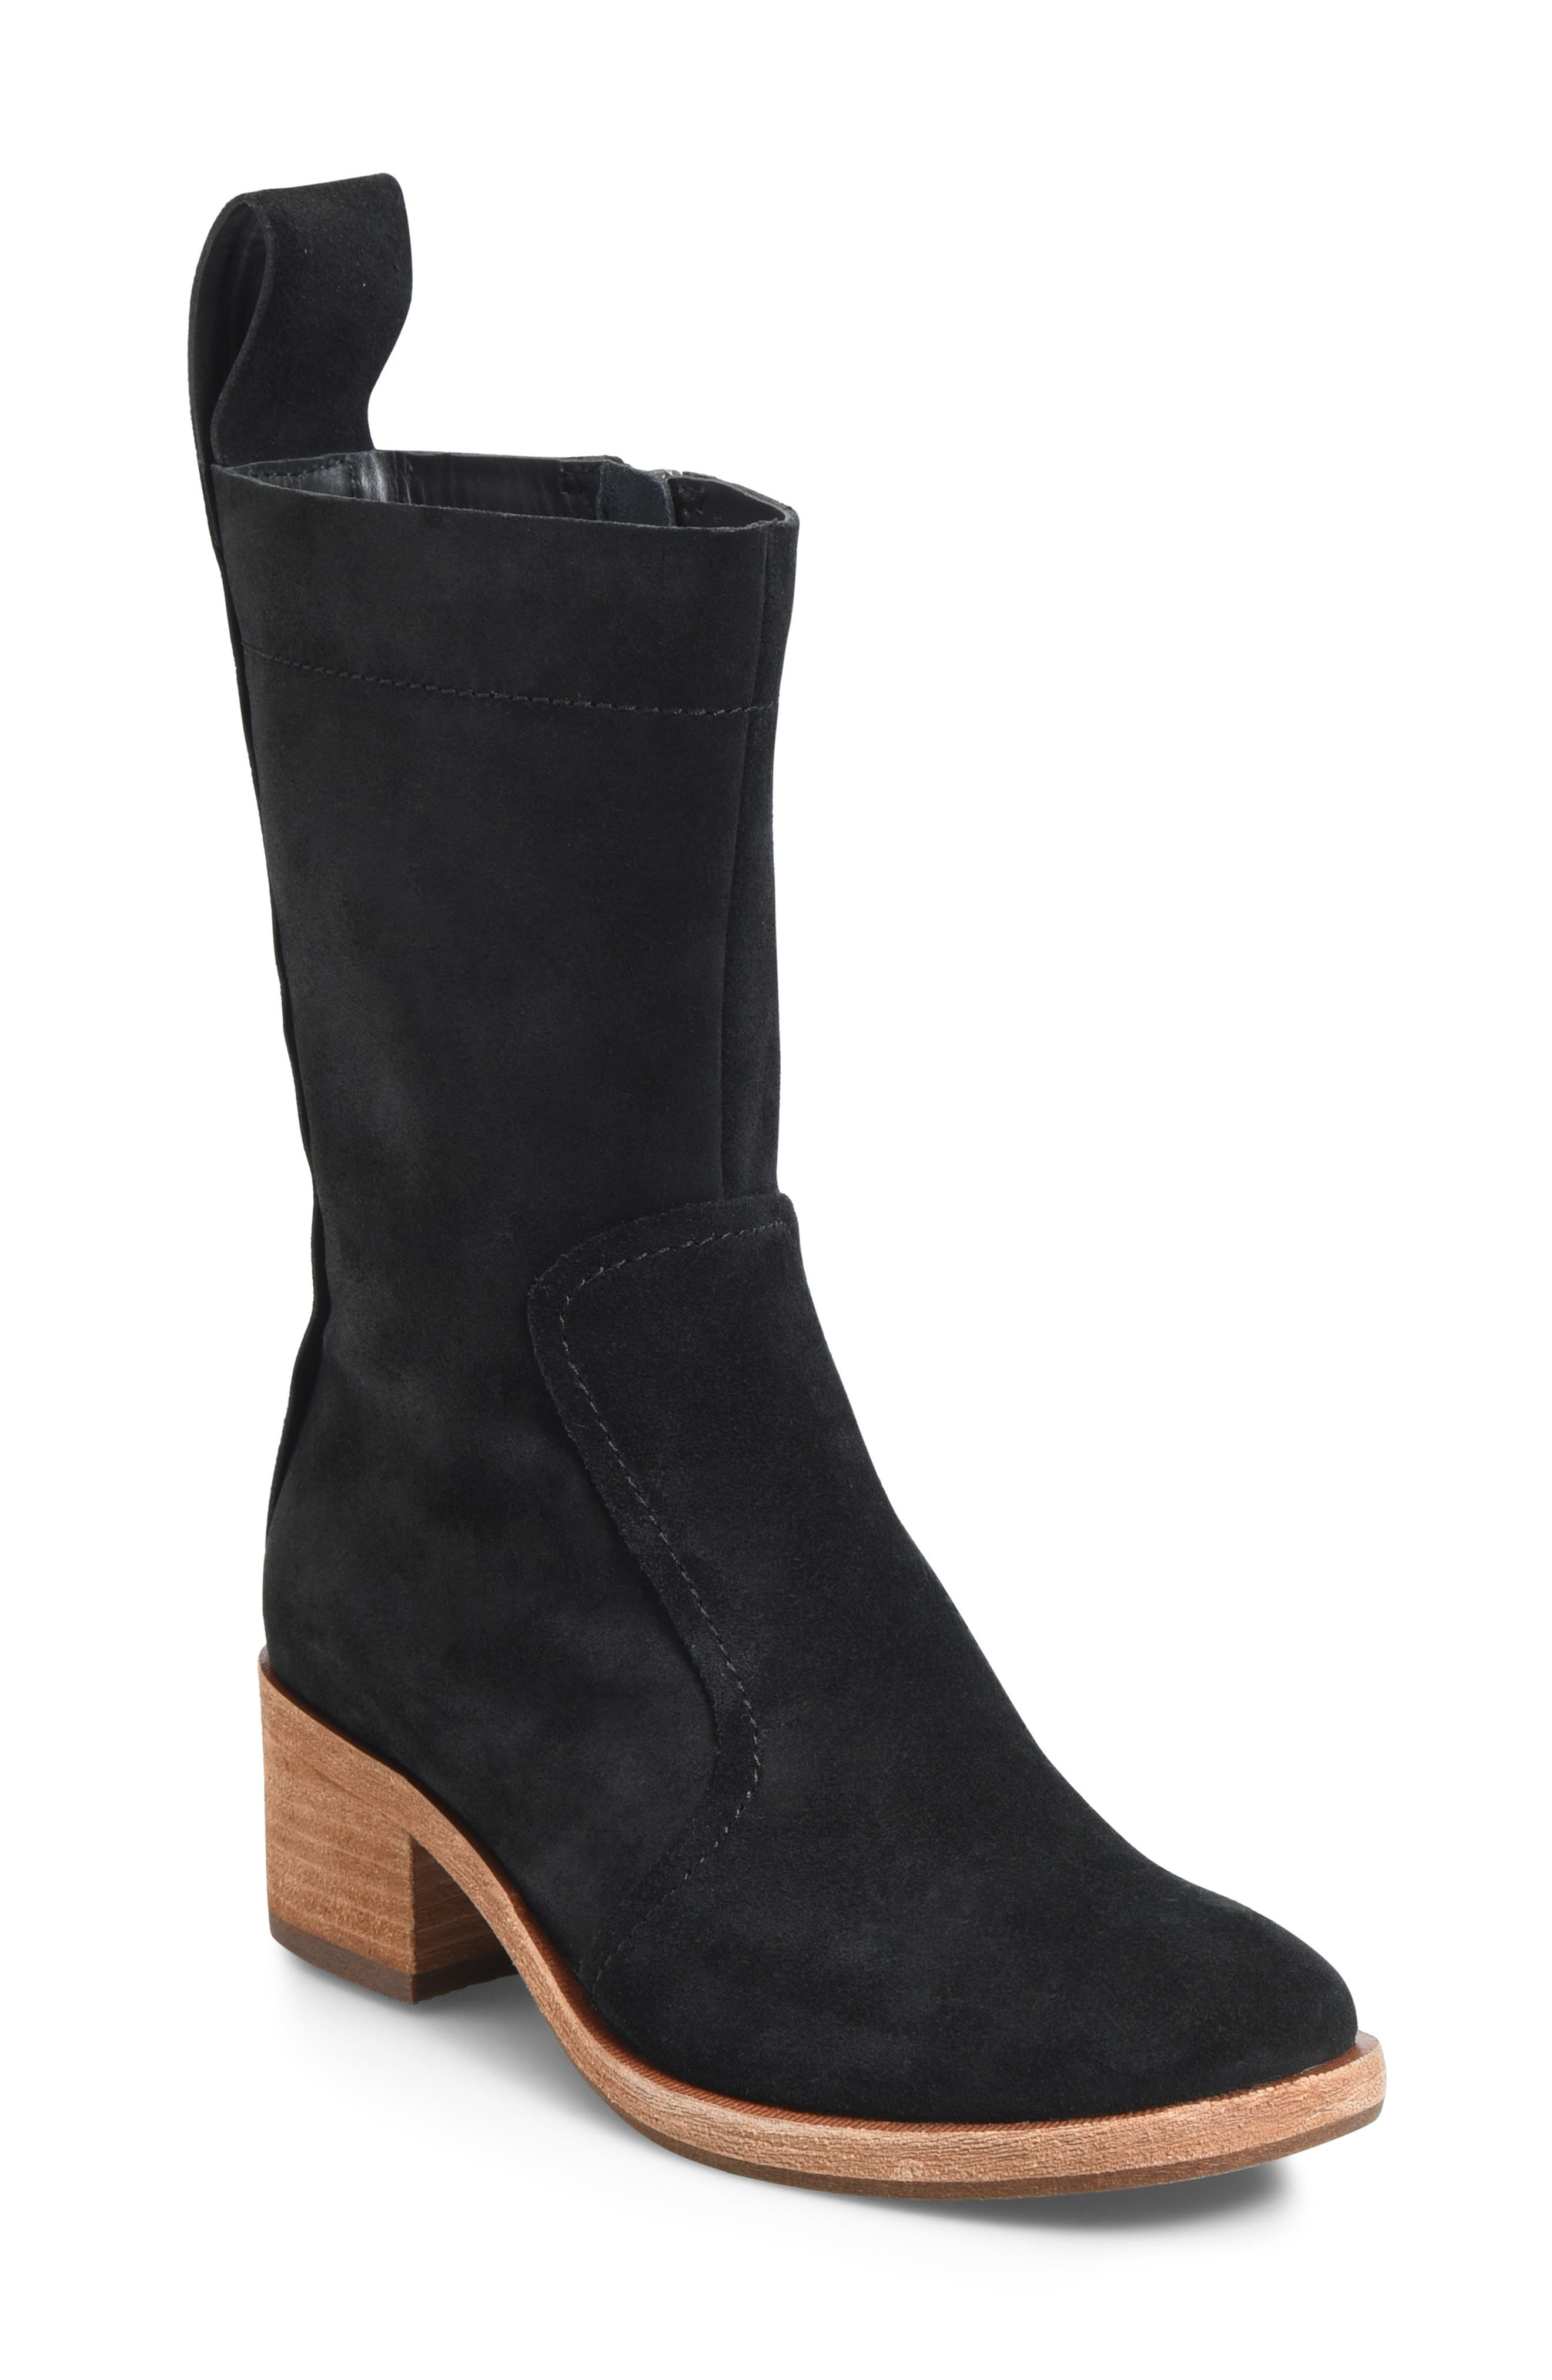 Kork-Ease Jewel Boot, Black